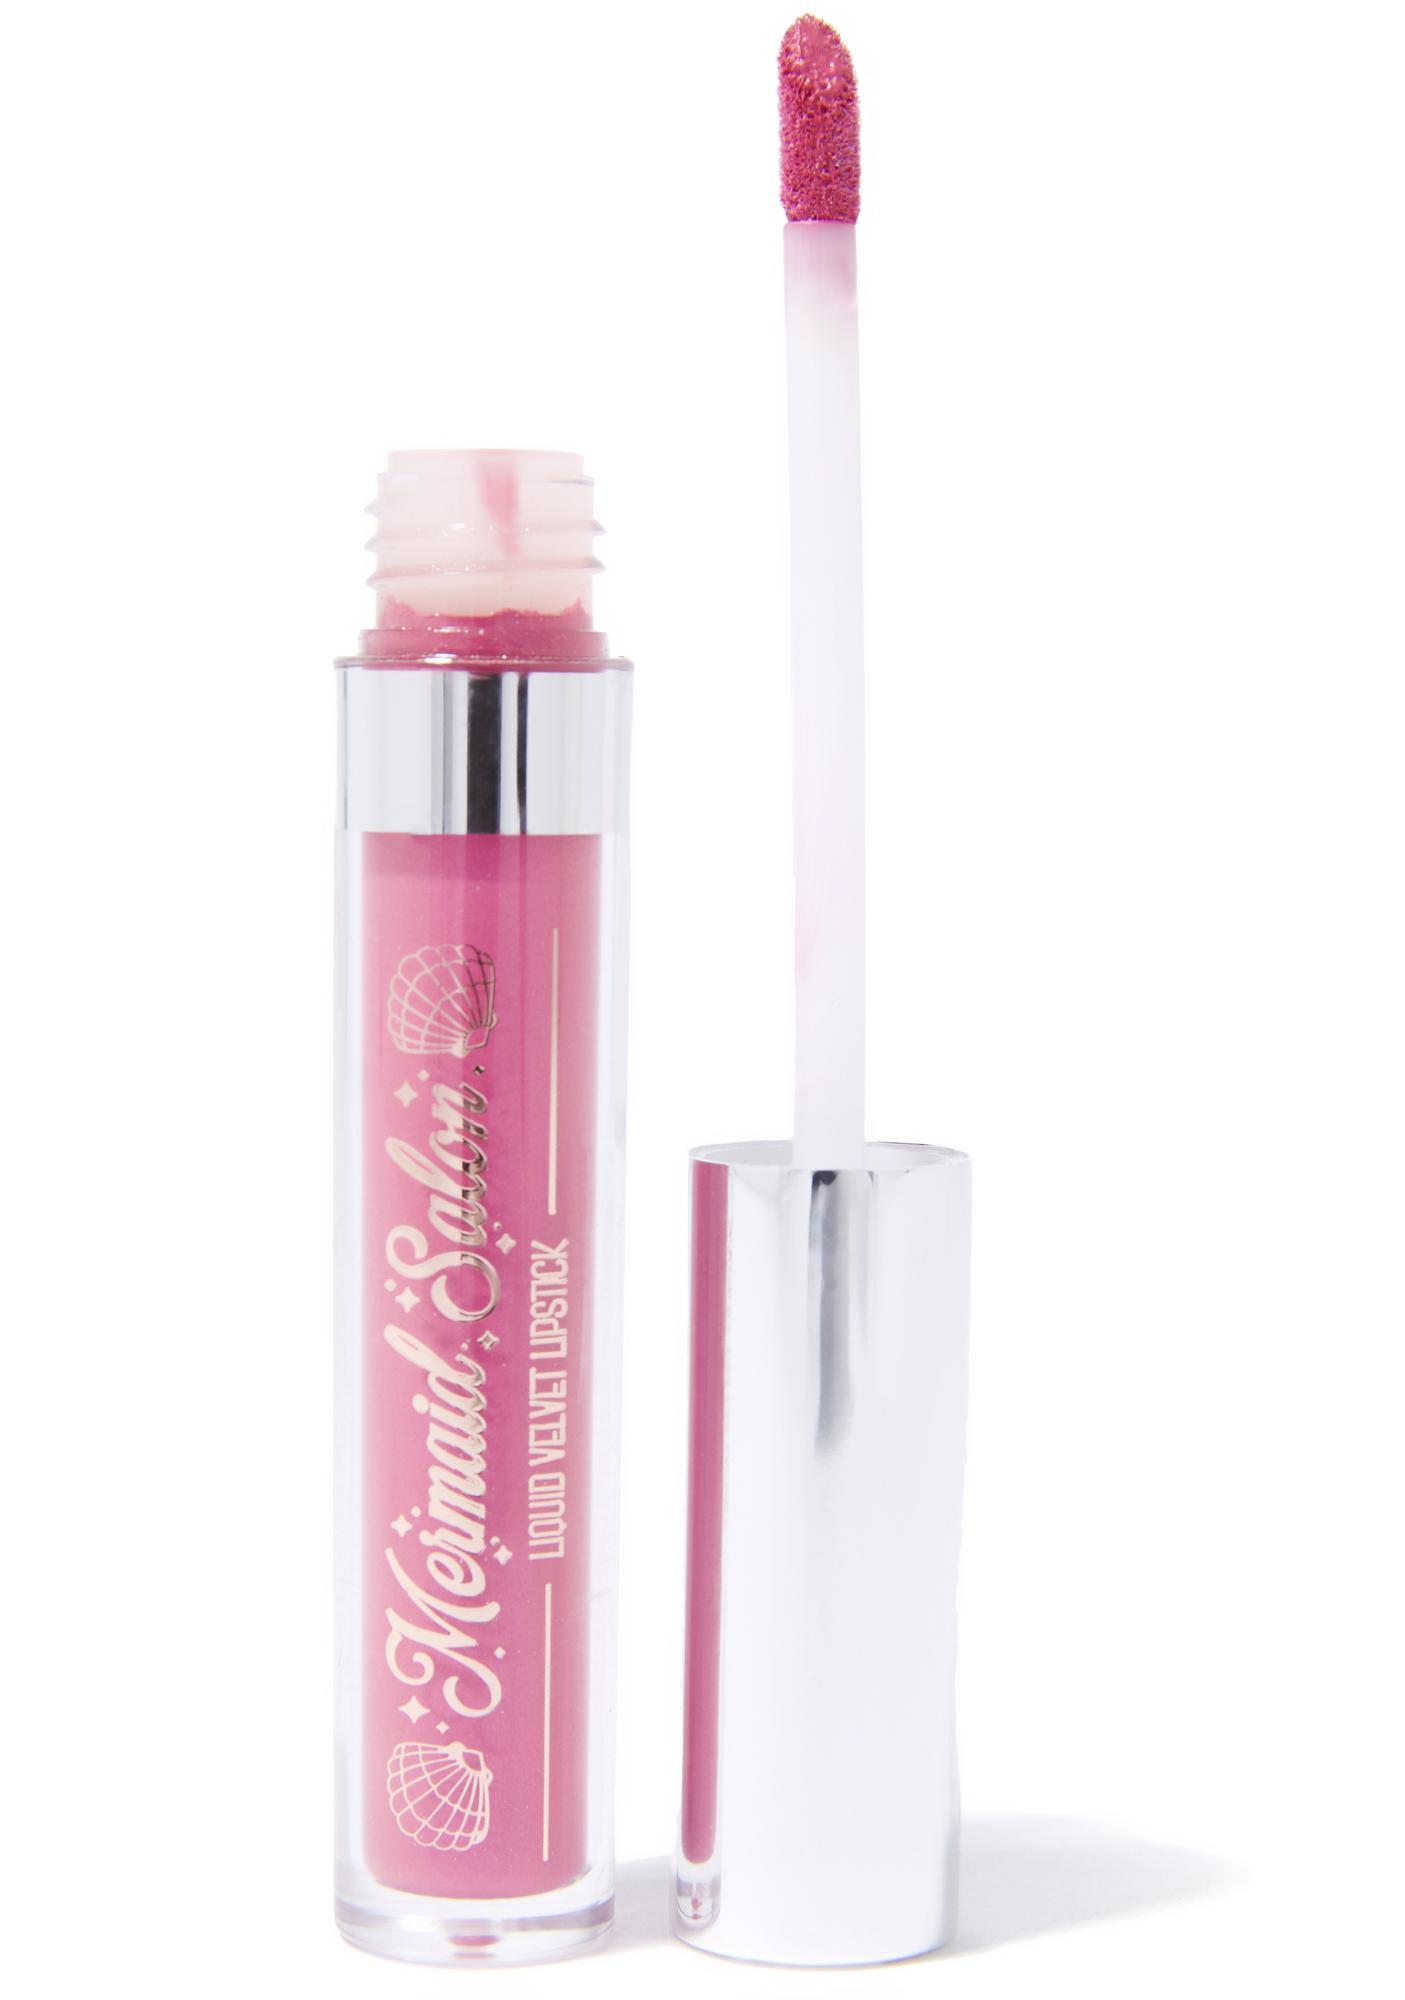 Mermaid Salon Queen Anne Liquid Lipstick